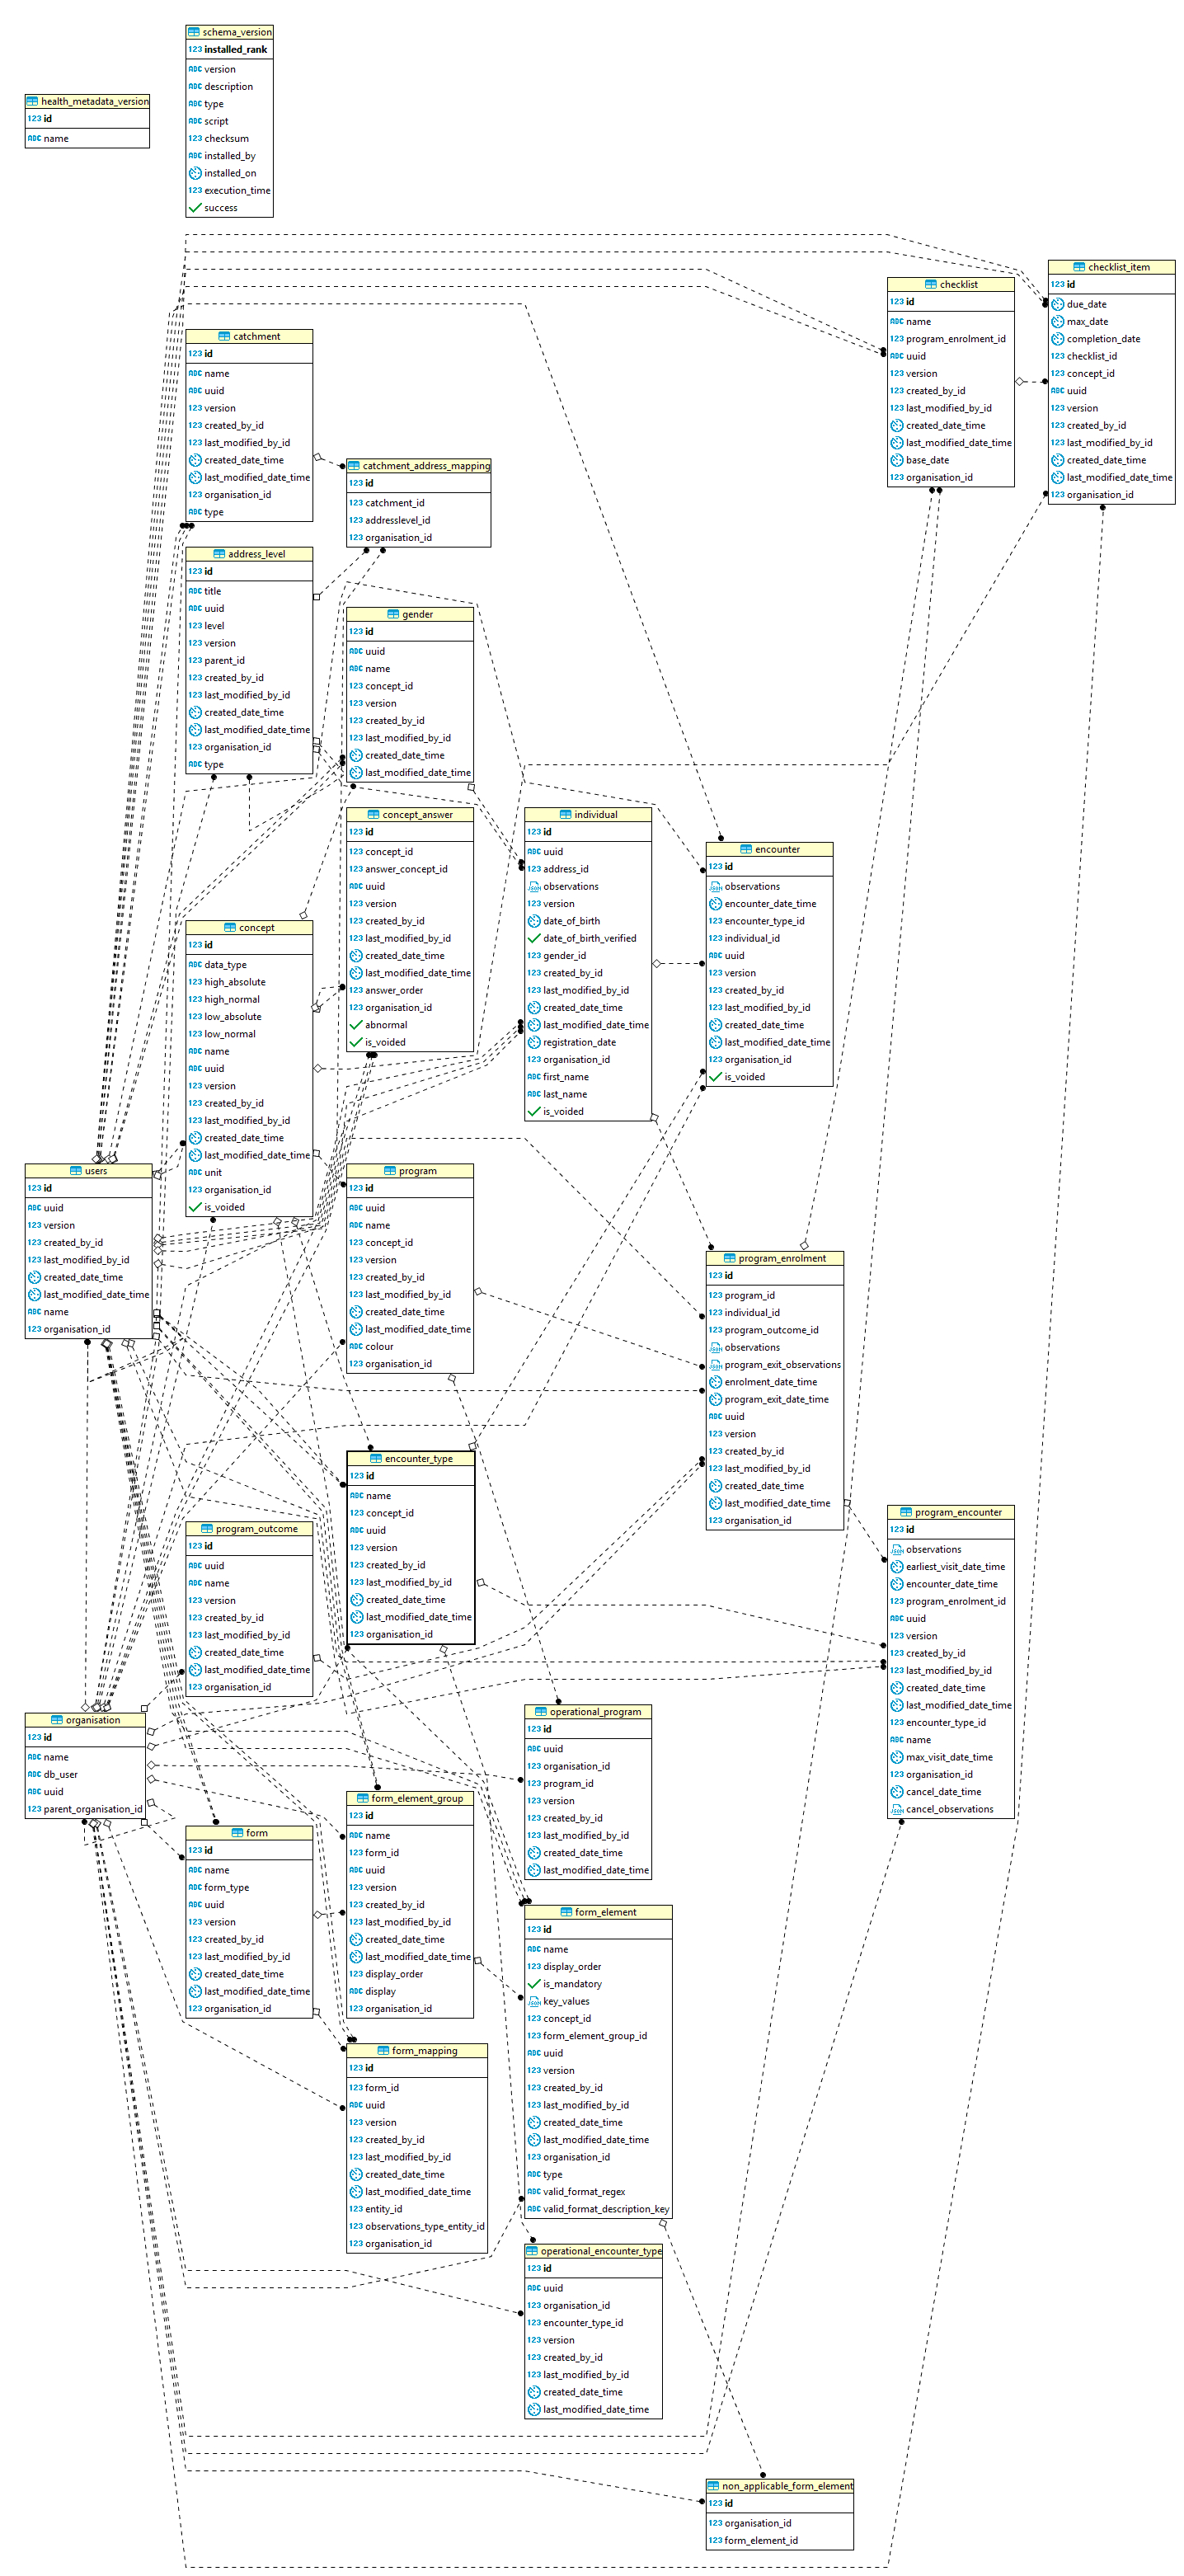 Database Relational Model Diagram inside Db Model Diagram